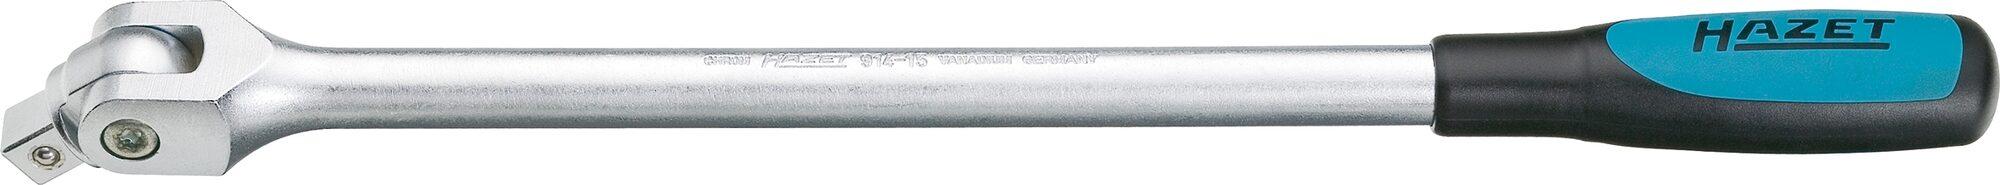 HAZET Gelenkgriff 914-15 ∙ Vierkant massiv 12,5 mm (1/2 Zoll)